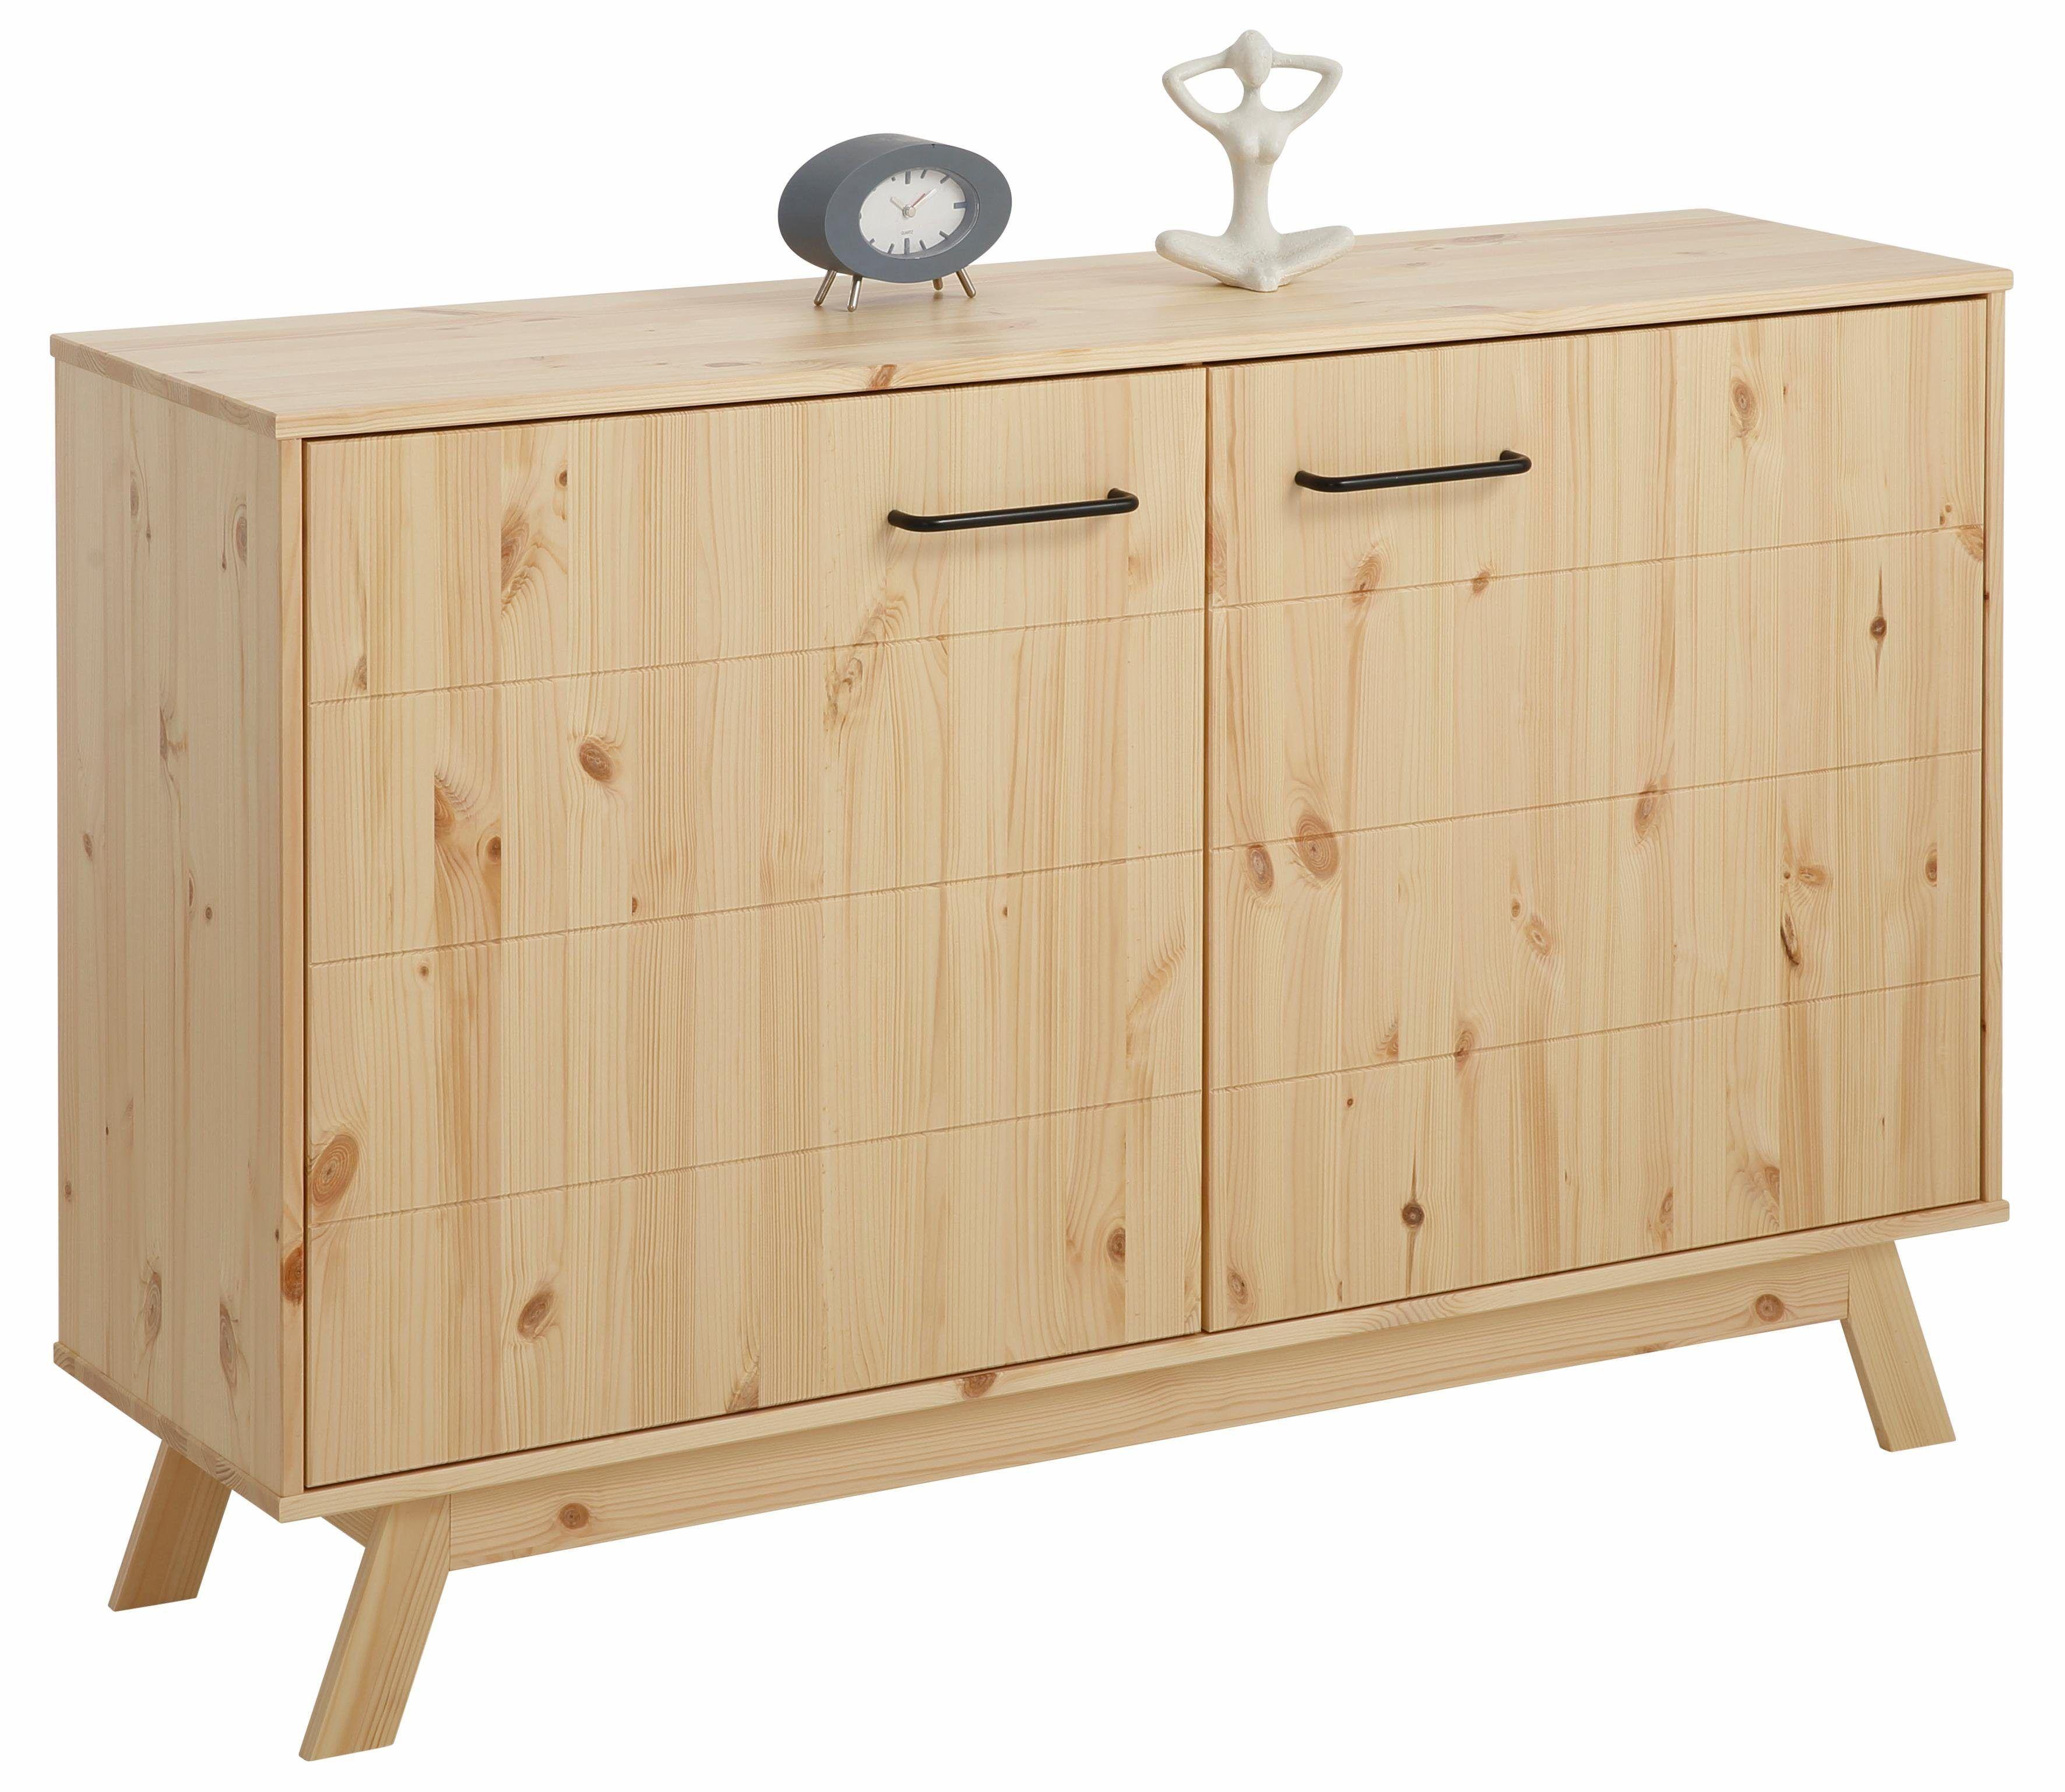 Home Affaire Kommode New Nordic Beige Fsc Zertifiziert Jetzt